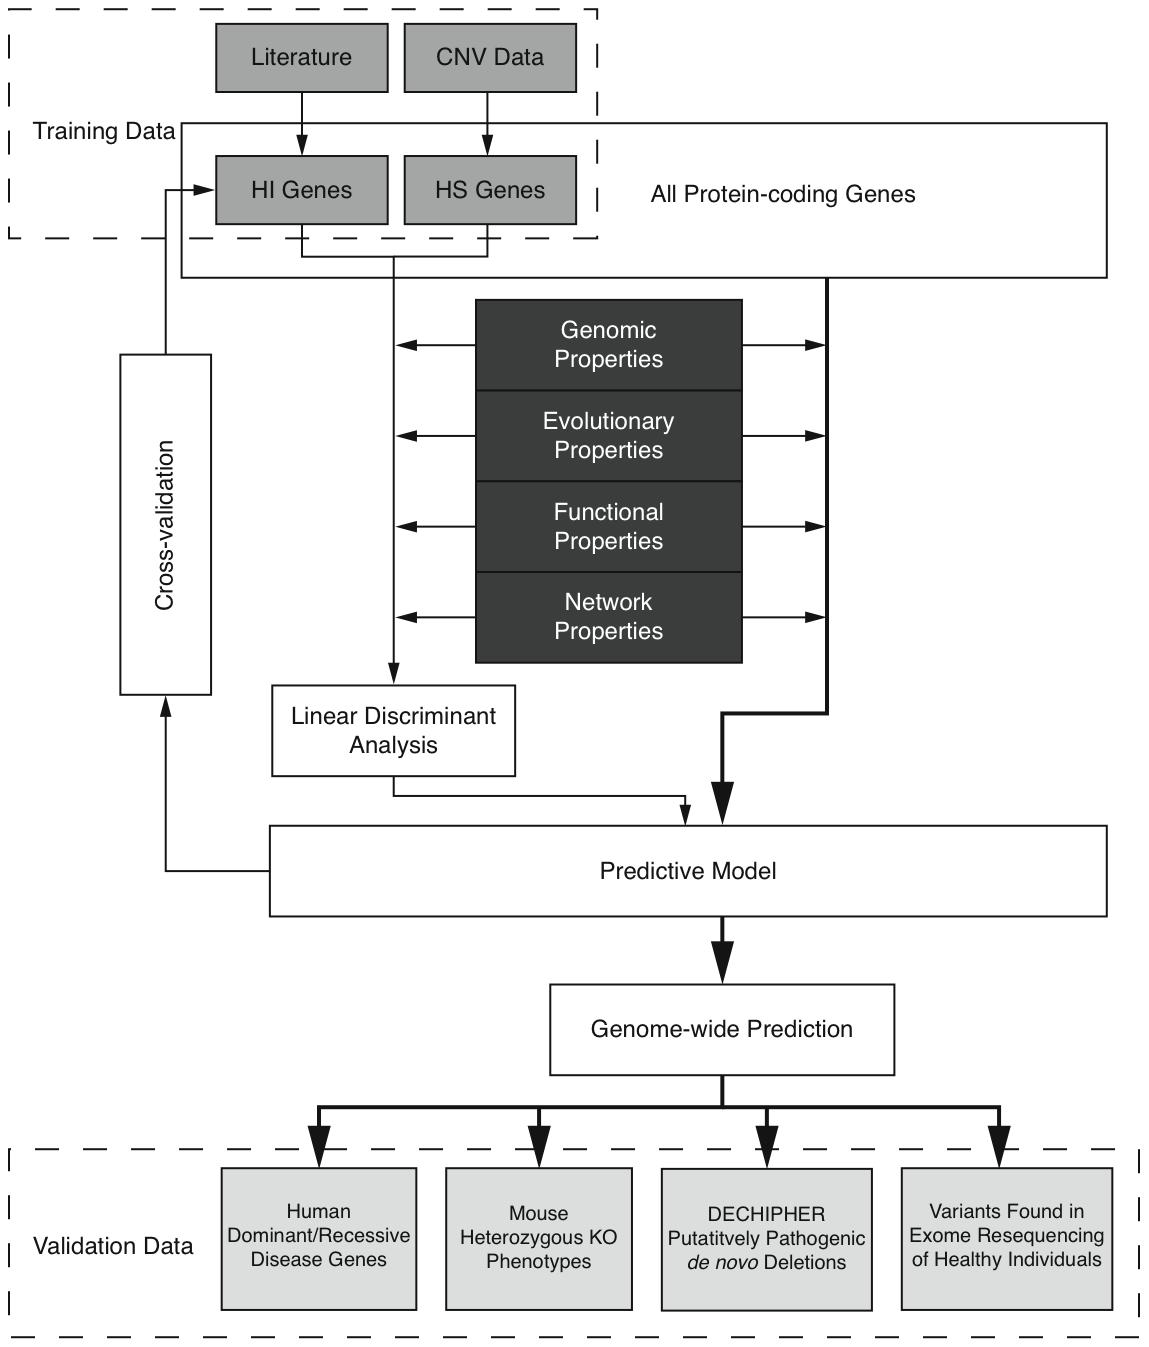 Outline of the prediction framework.